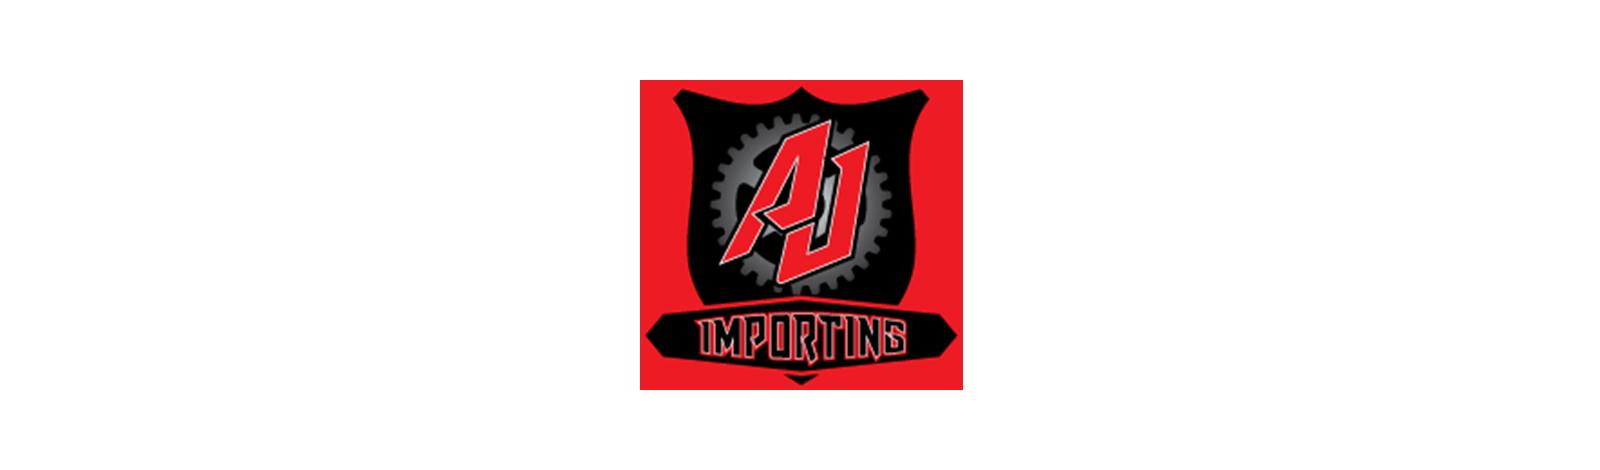 AJ Importing   Automotive Importing